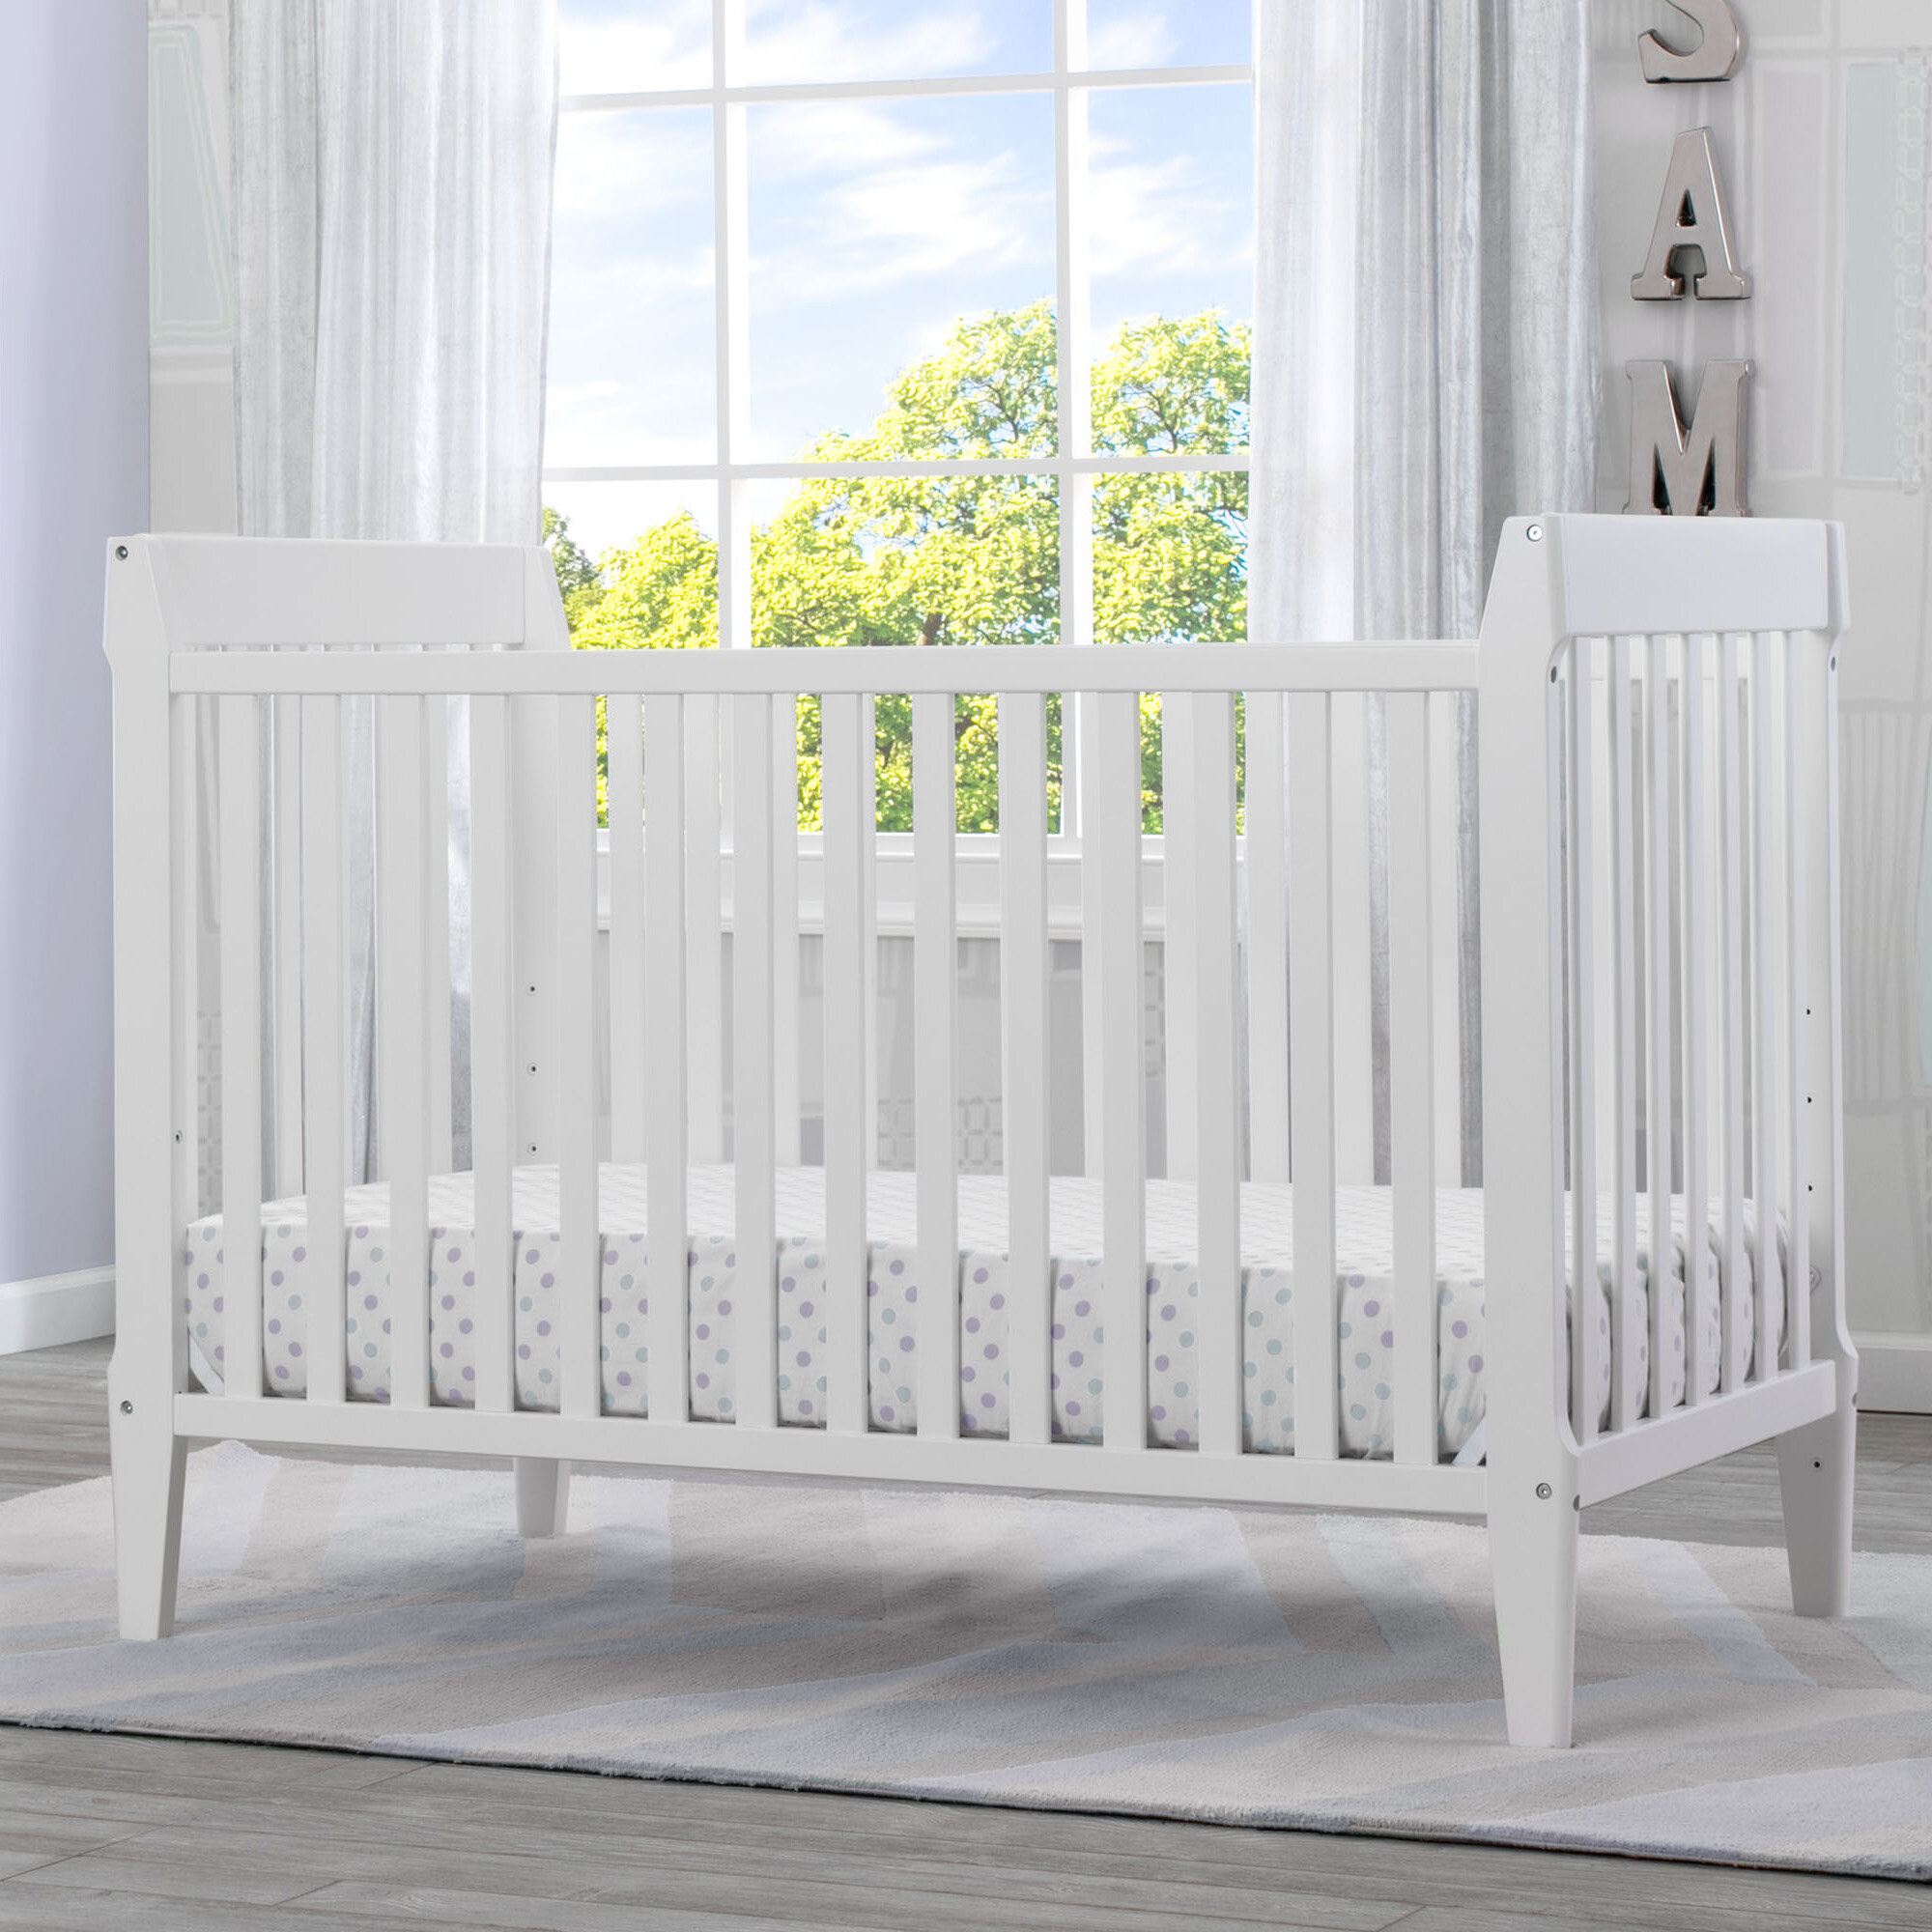 zaneursitoare sets century mid bedroom collection crib cribs modern affordable